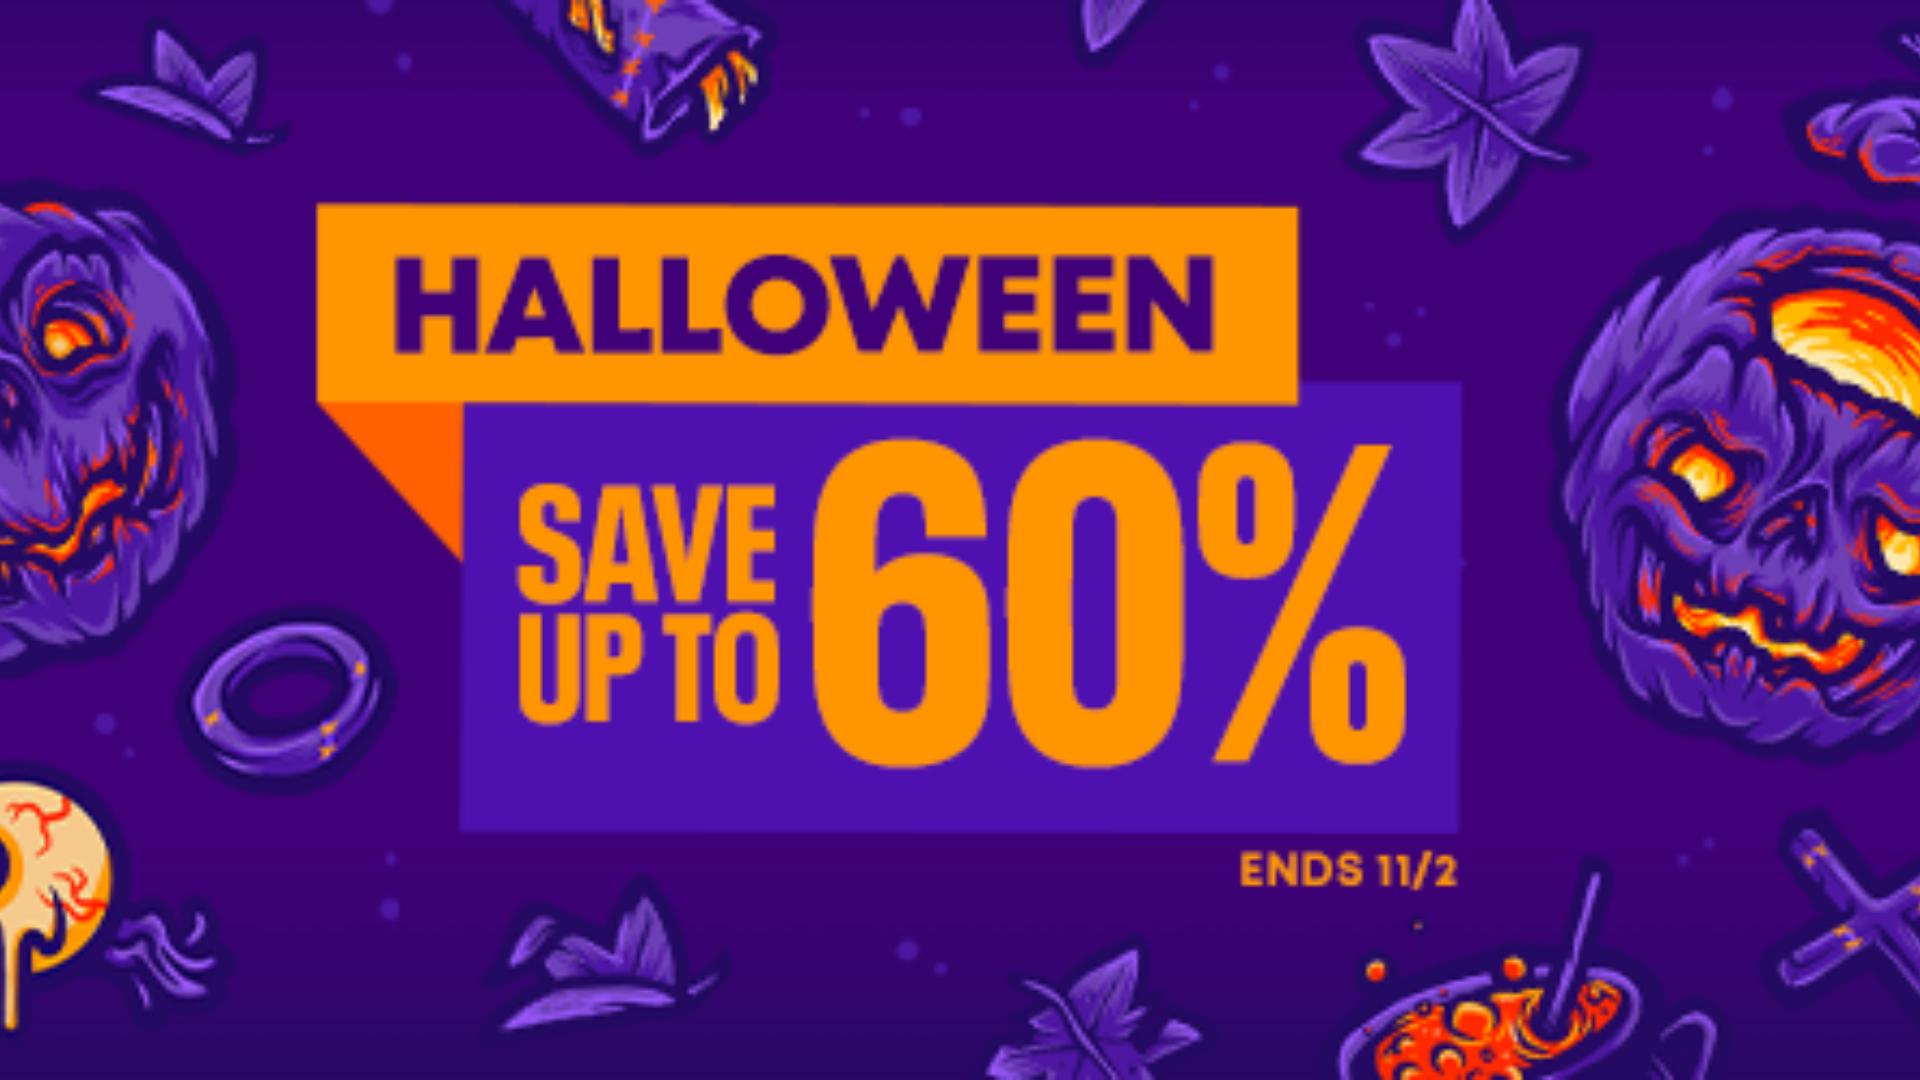 Playstation Deals: Halloween 2020